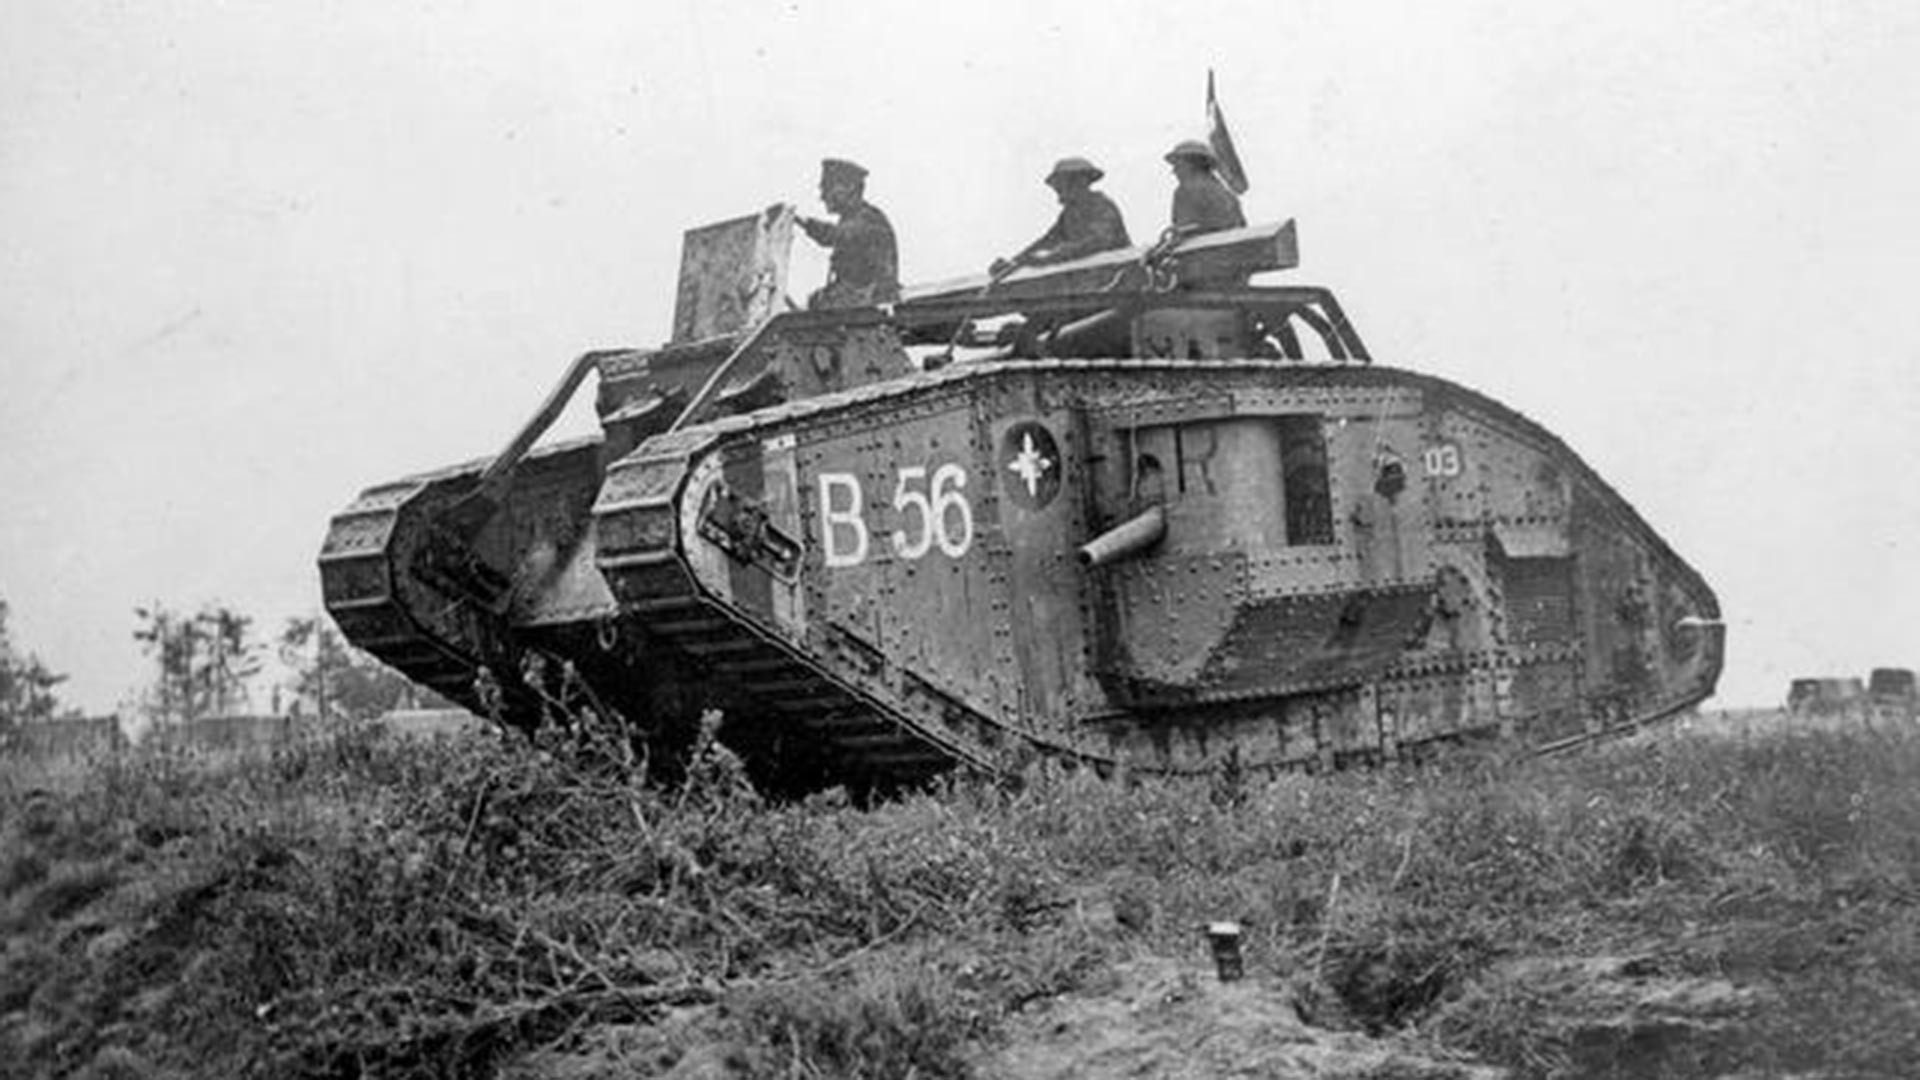 A British Mark V tank.